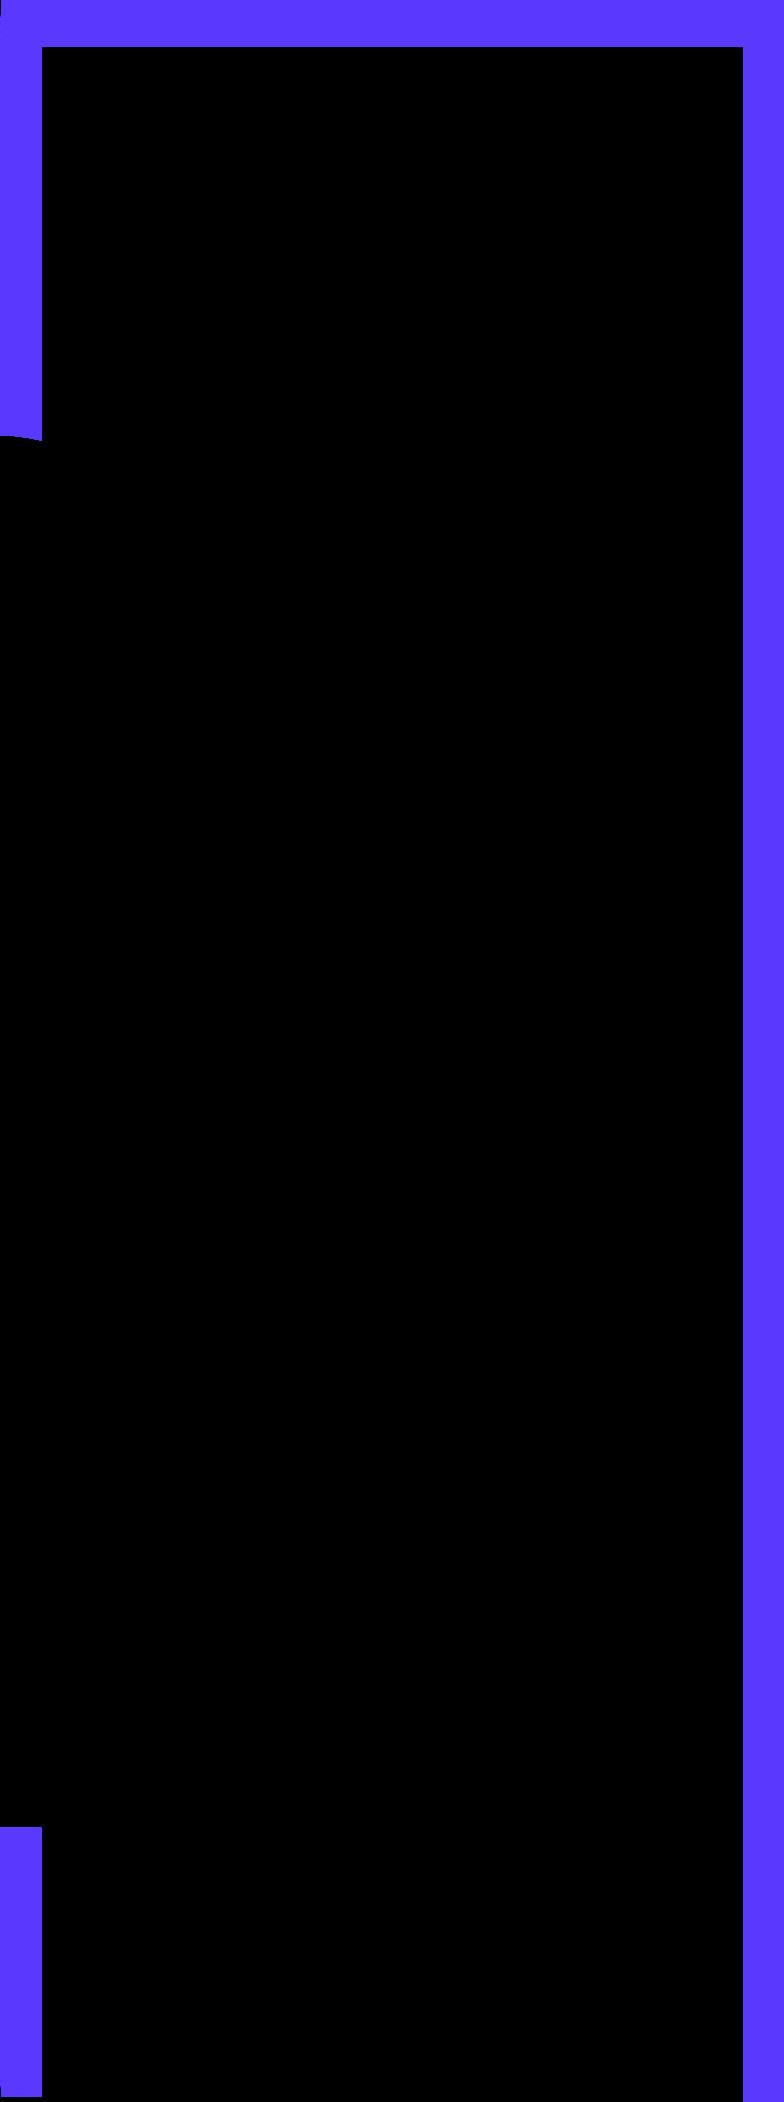 doorway crop Clipart illustration in PNG, SVG